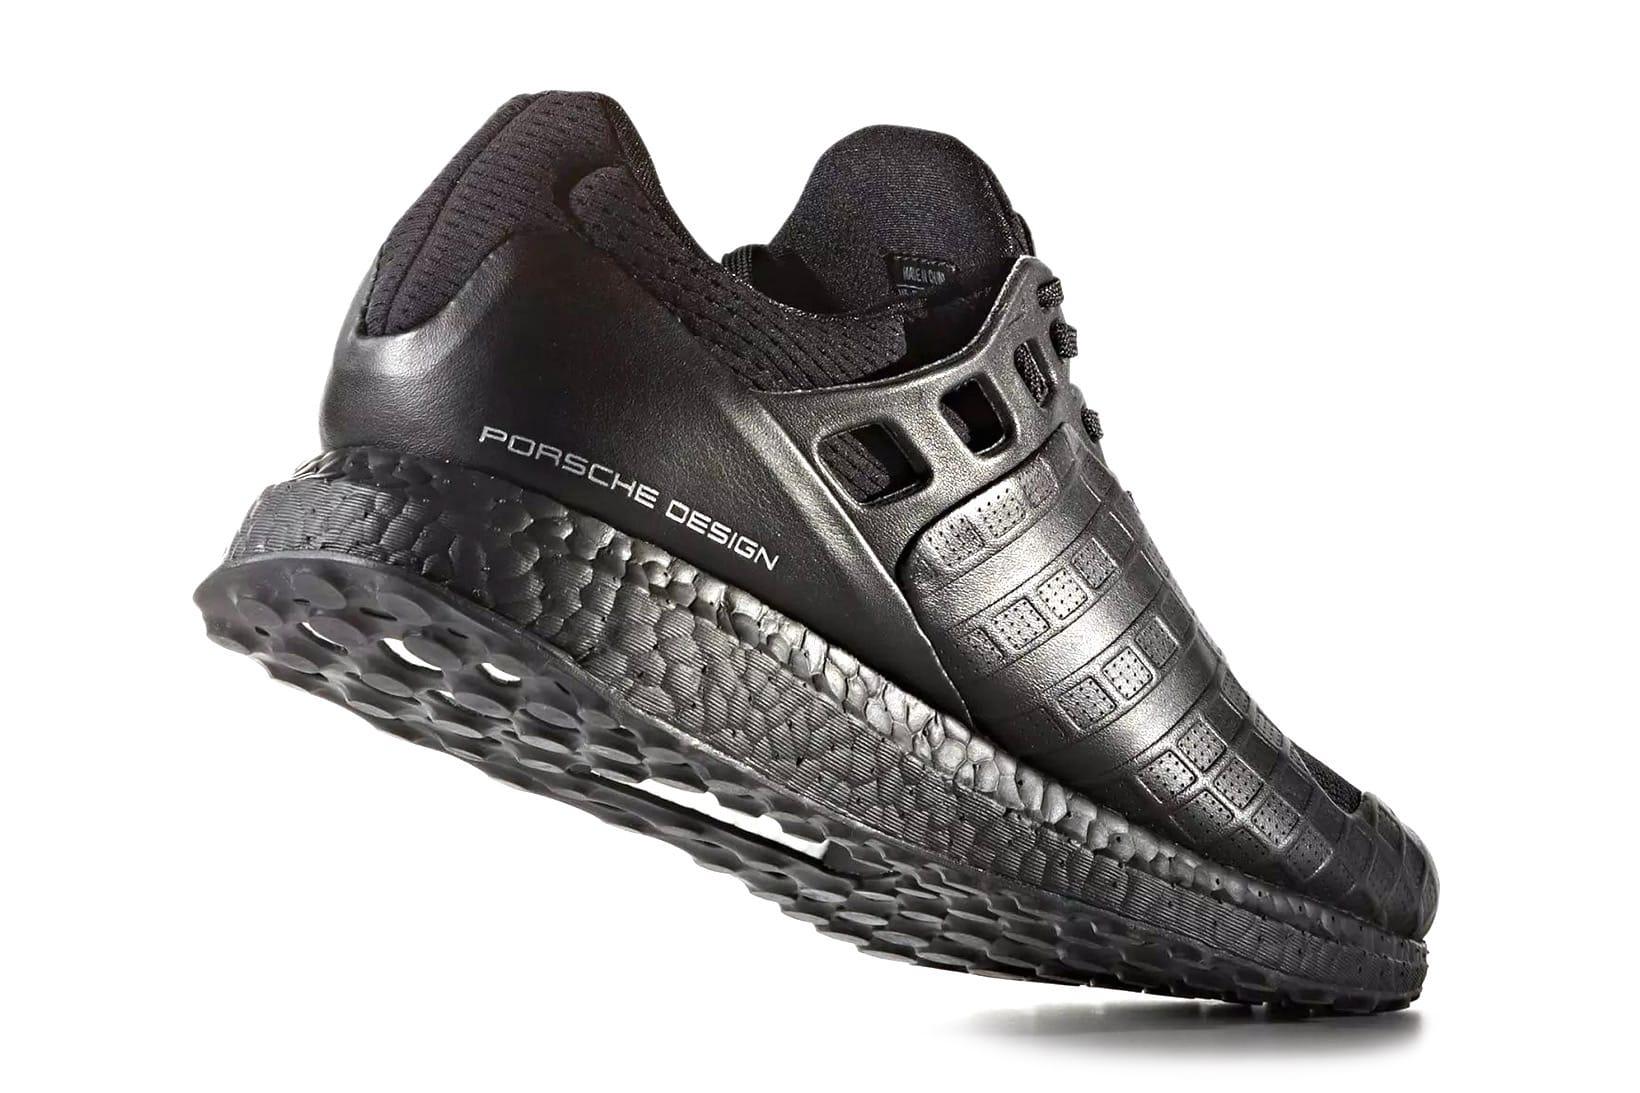 Duque Constituir Pendiente  adidas porsche design Online Shopping for Women, Men, Kids Fashion &  Lifestyle|Free Delivery & Returns! -